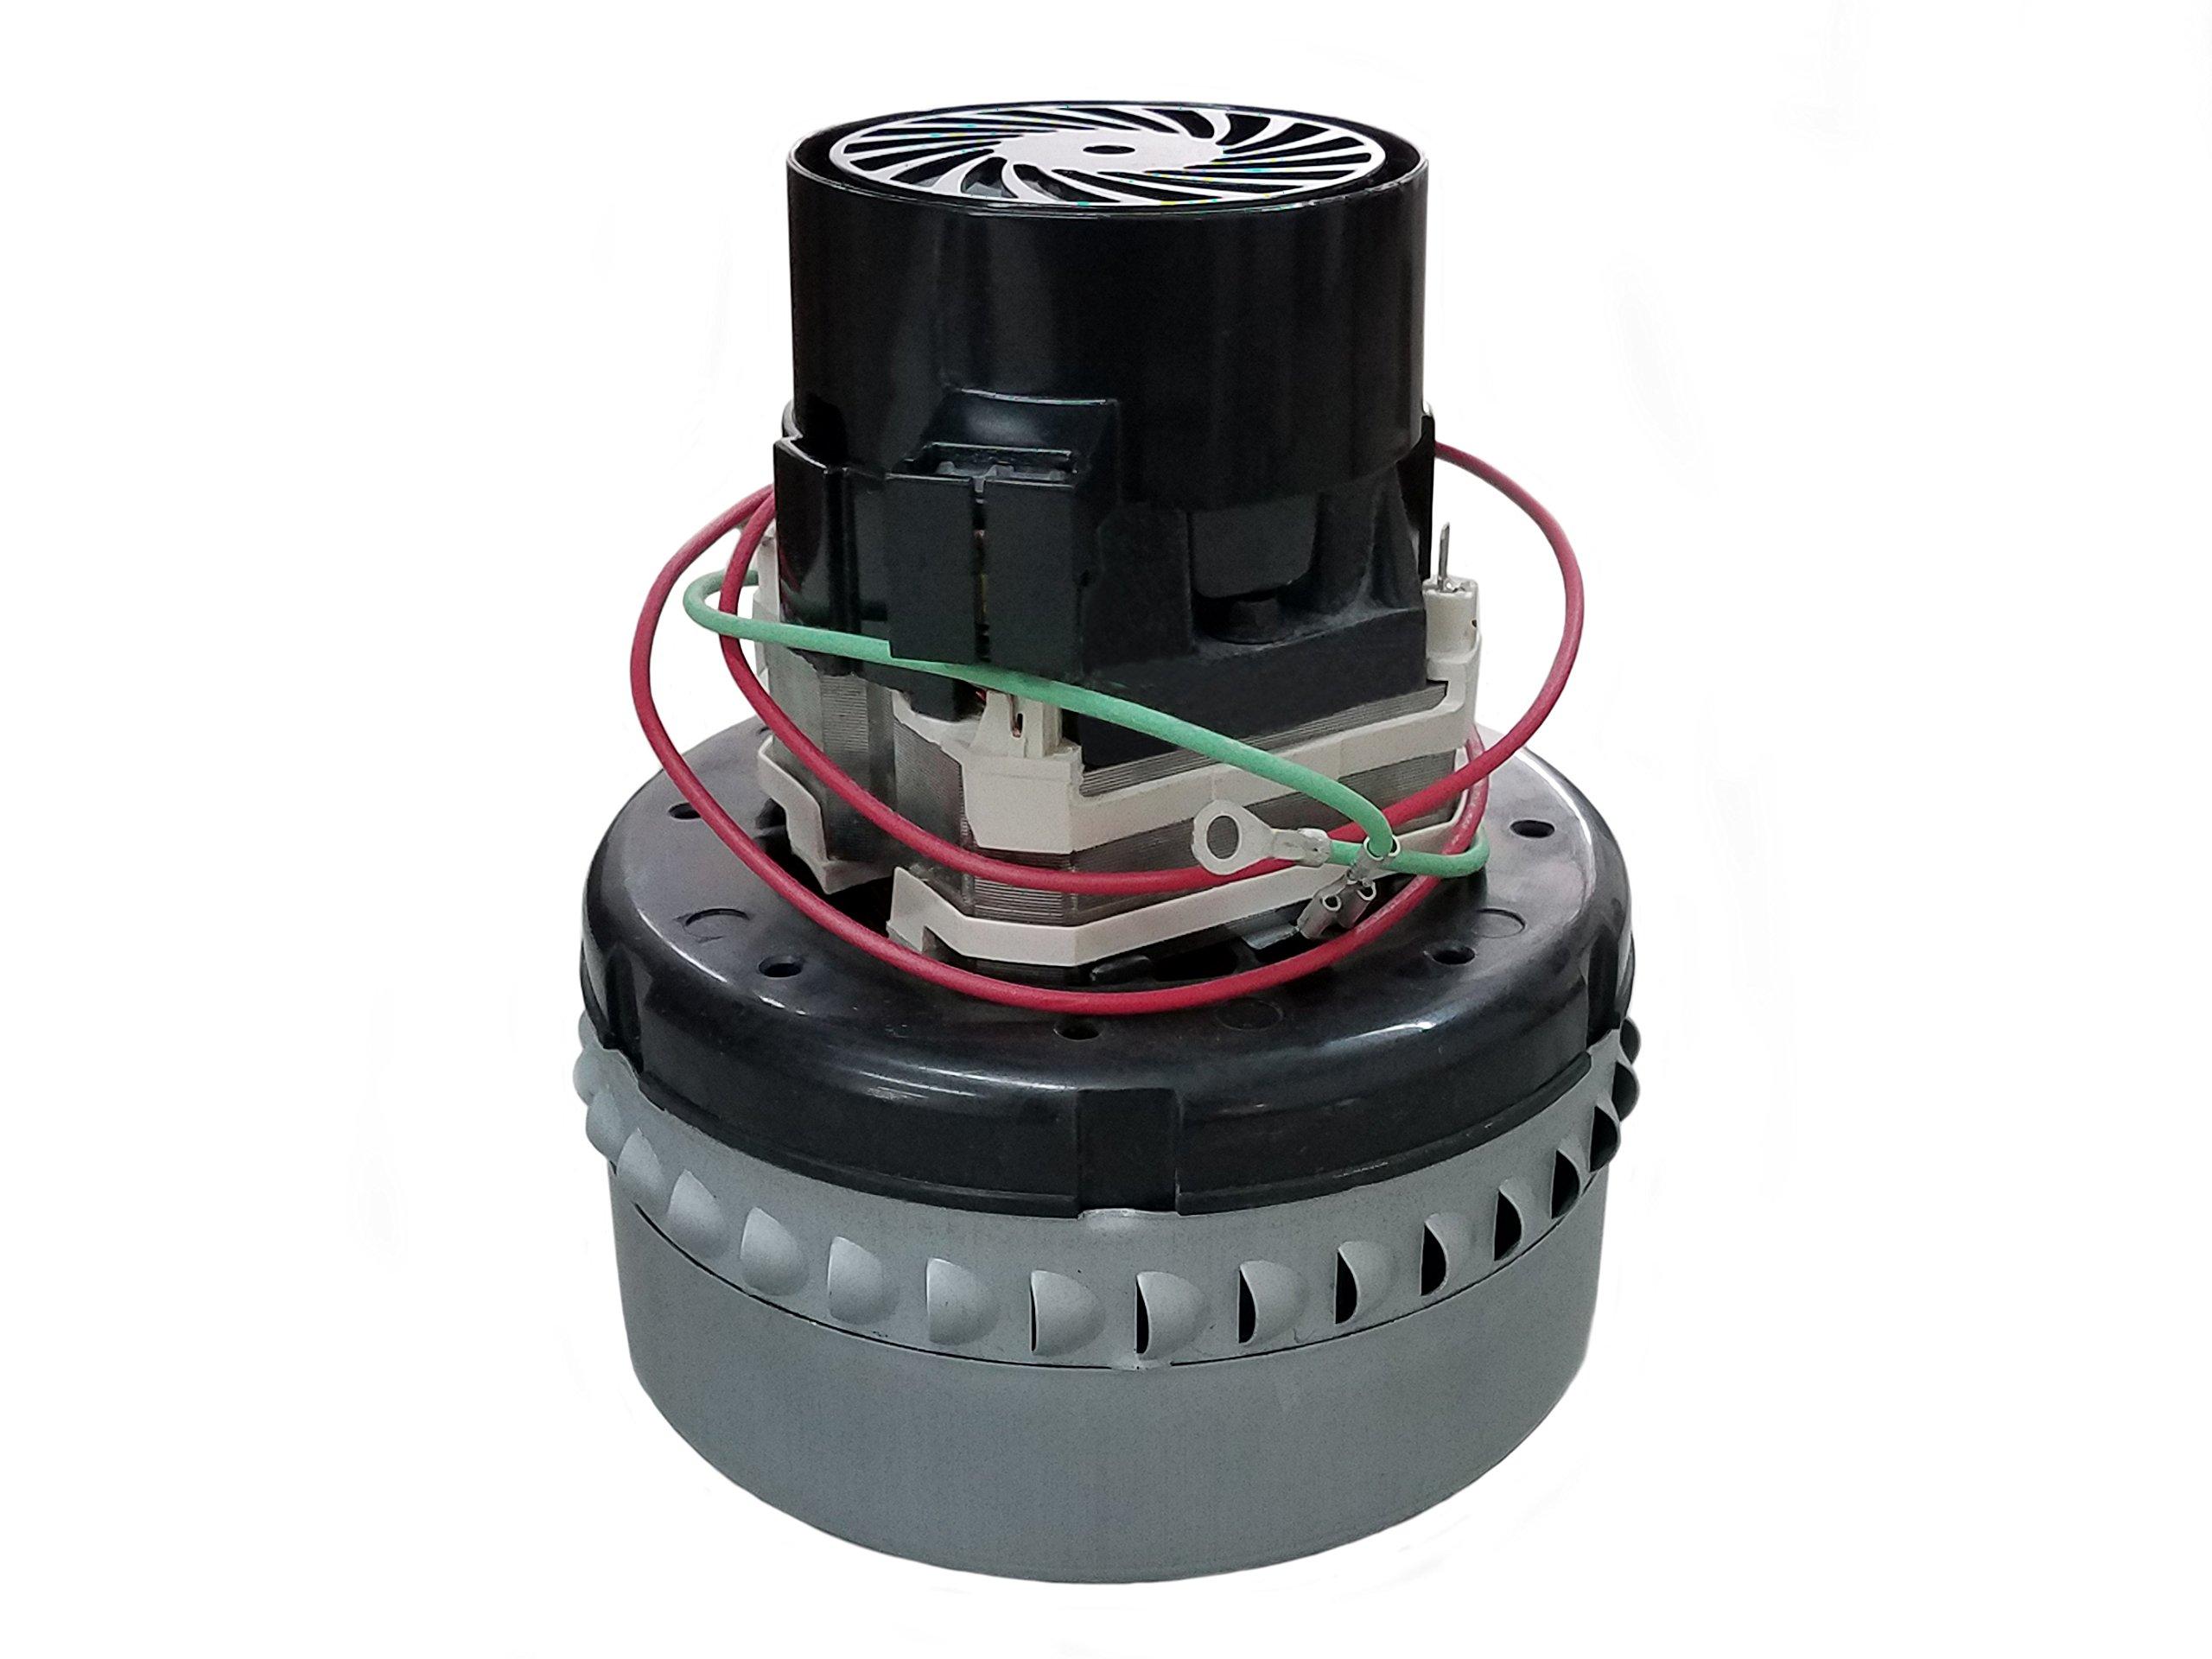 Electro Motor Car Wash Vacuum Motor 8055EM for JE Adams Vacuums, 110V by Ultimate Washer (Image #1)